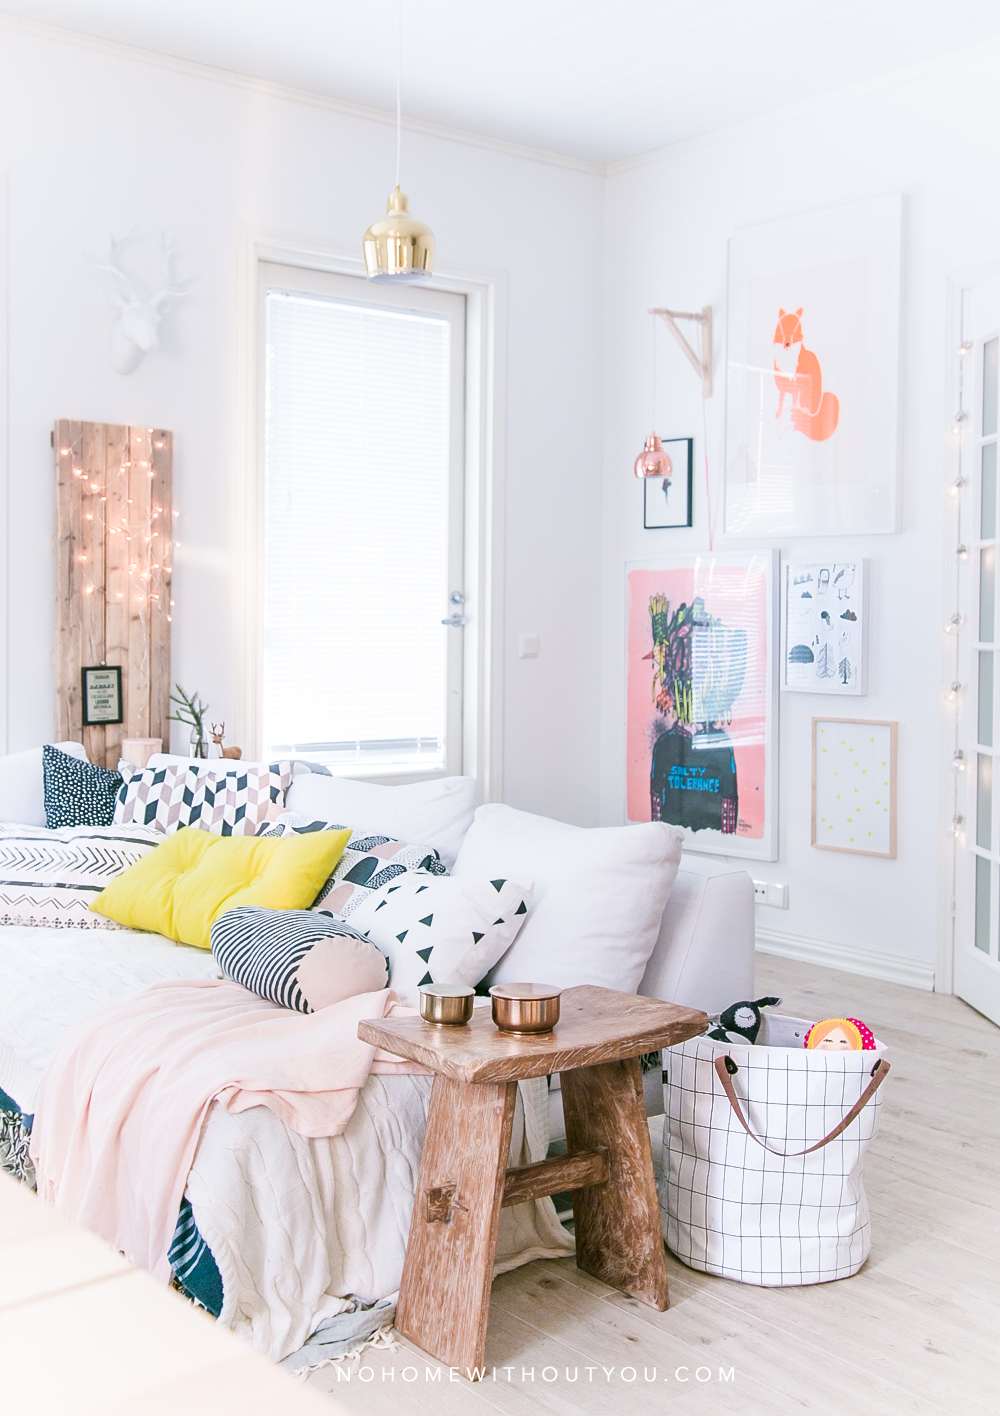 Uns zu hause innenarchitektur egy finn blogger mesés otthona  sajat otthon projekt  pinterest